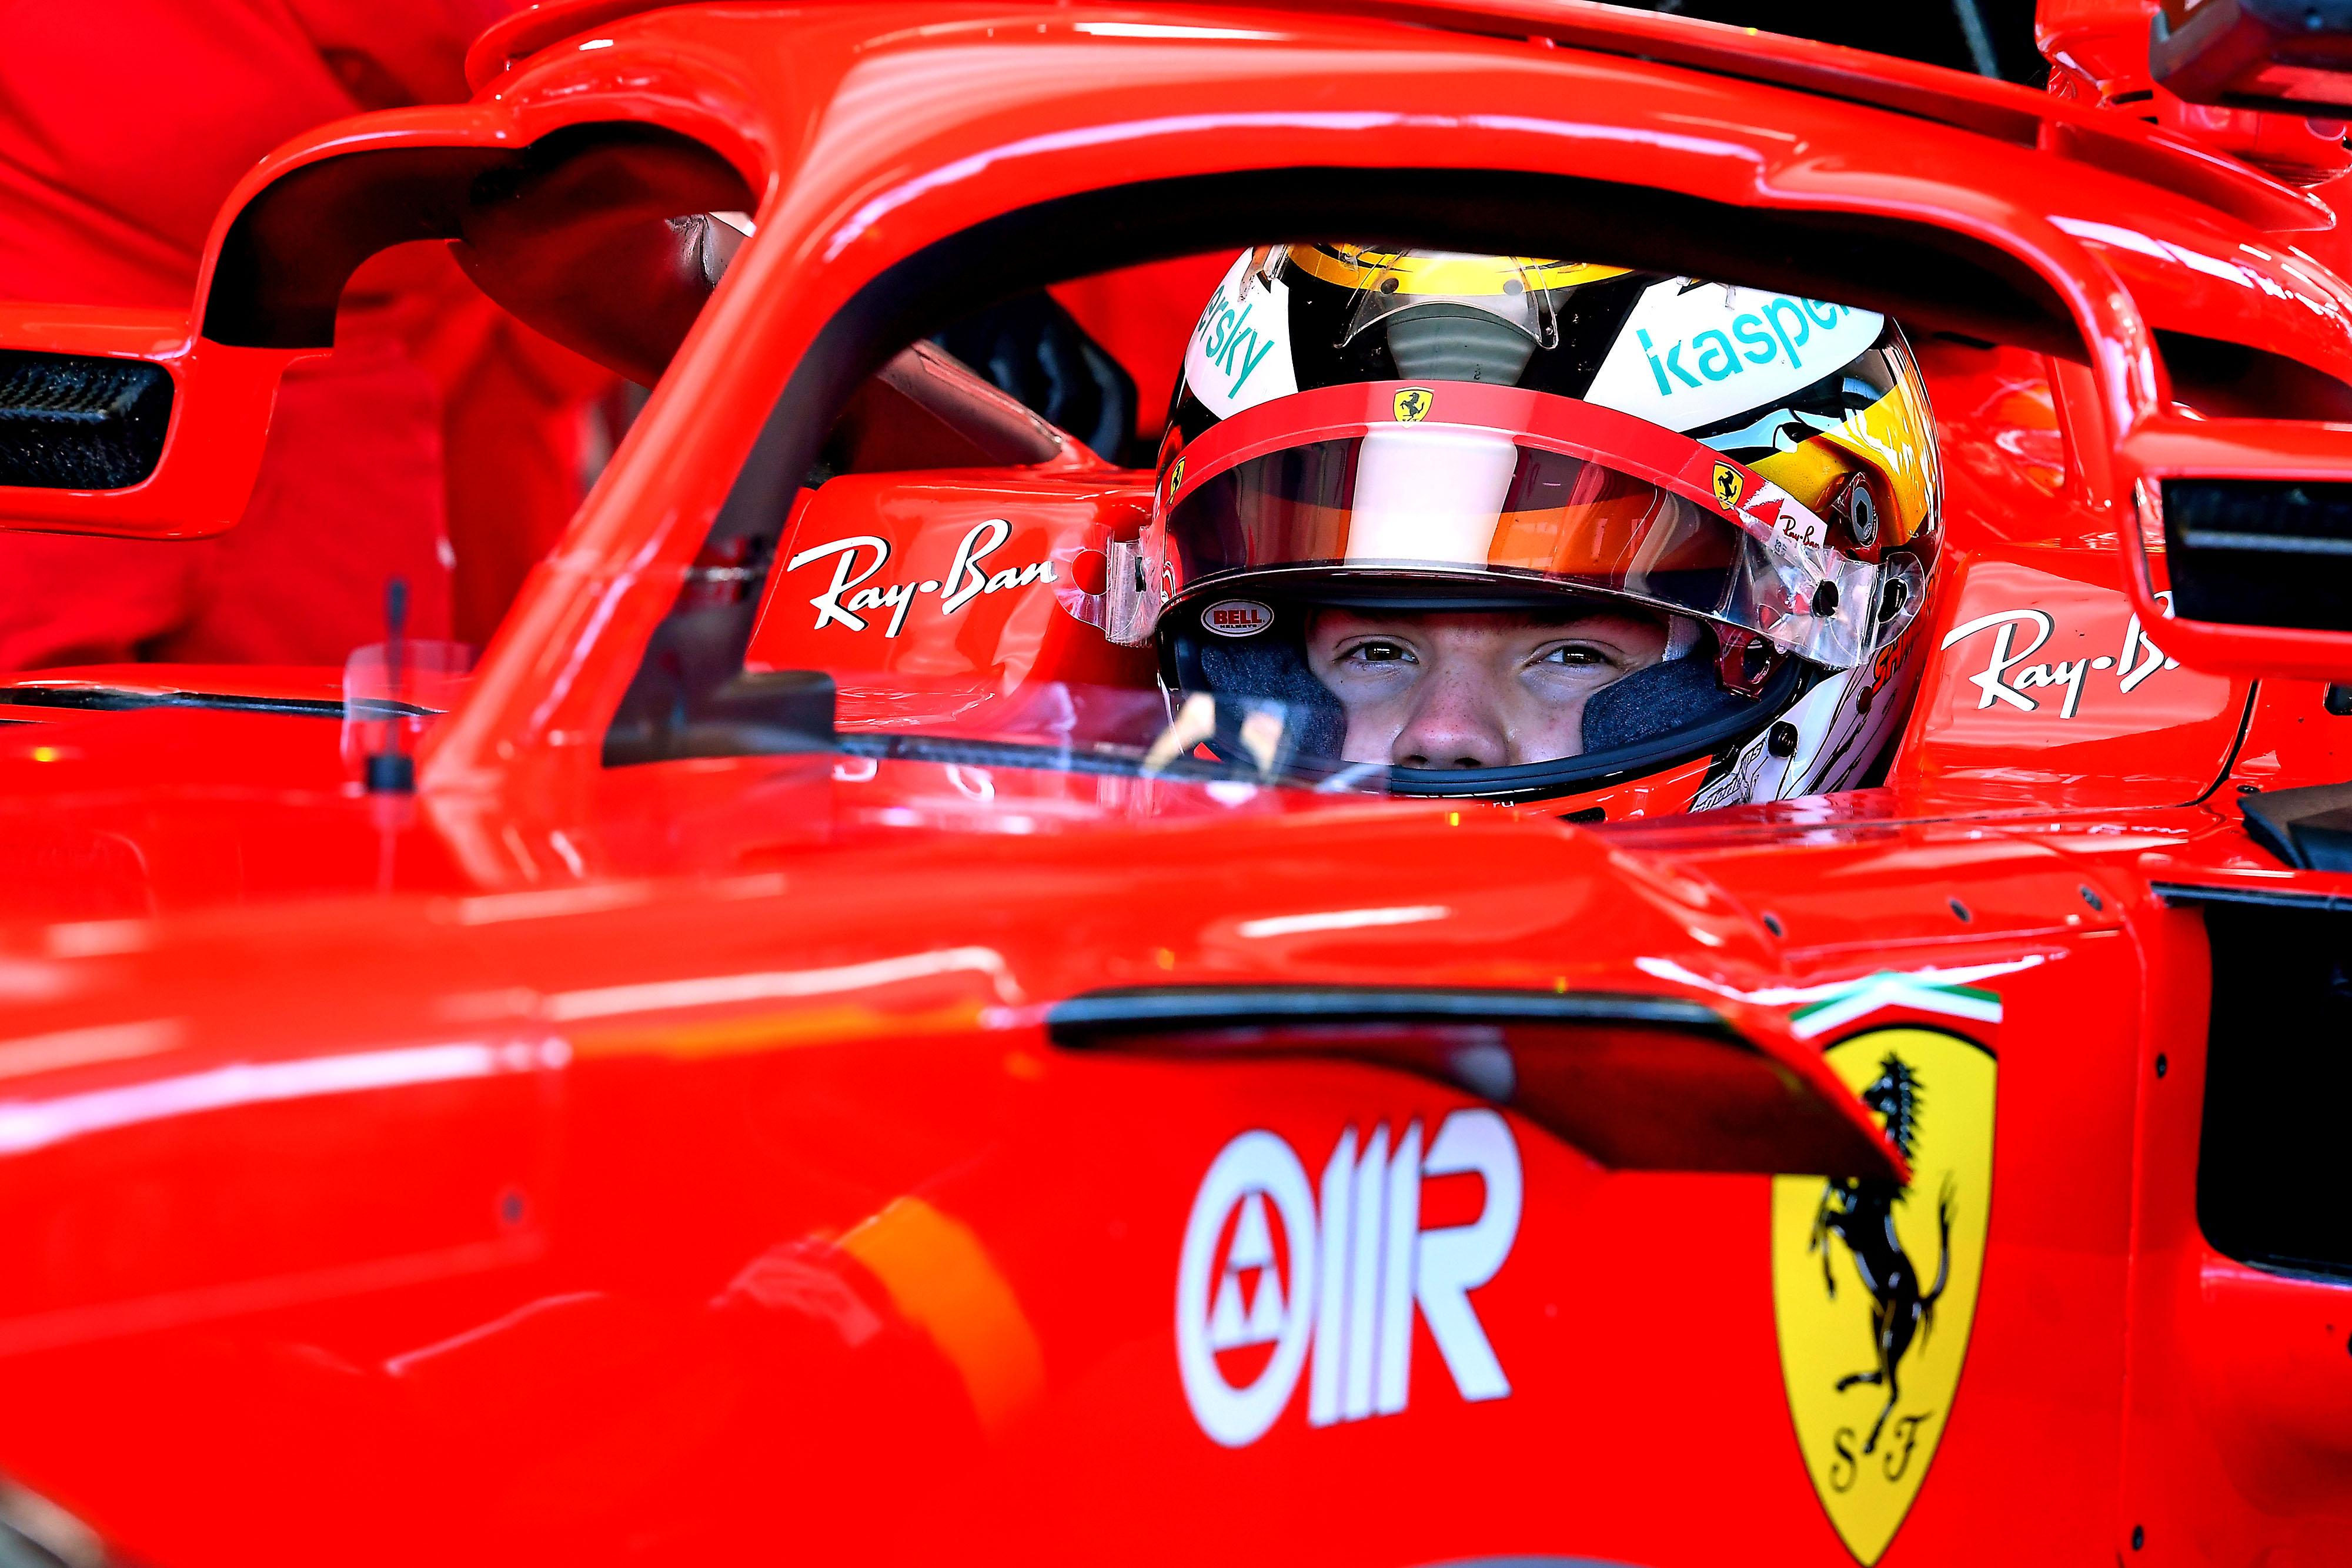 Fotó: Colombo / Scuderia Ferrari Press Office